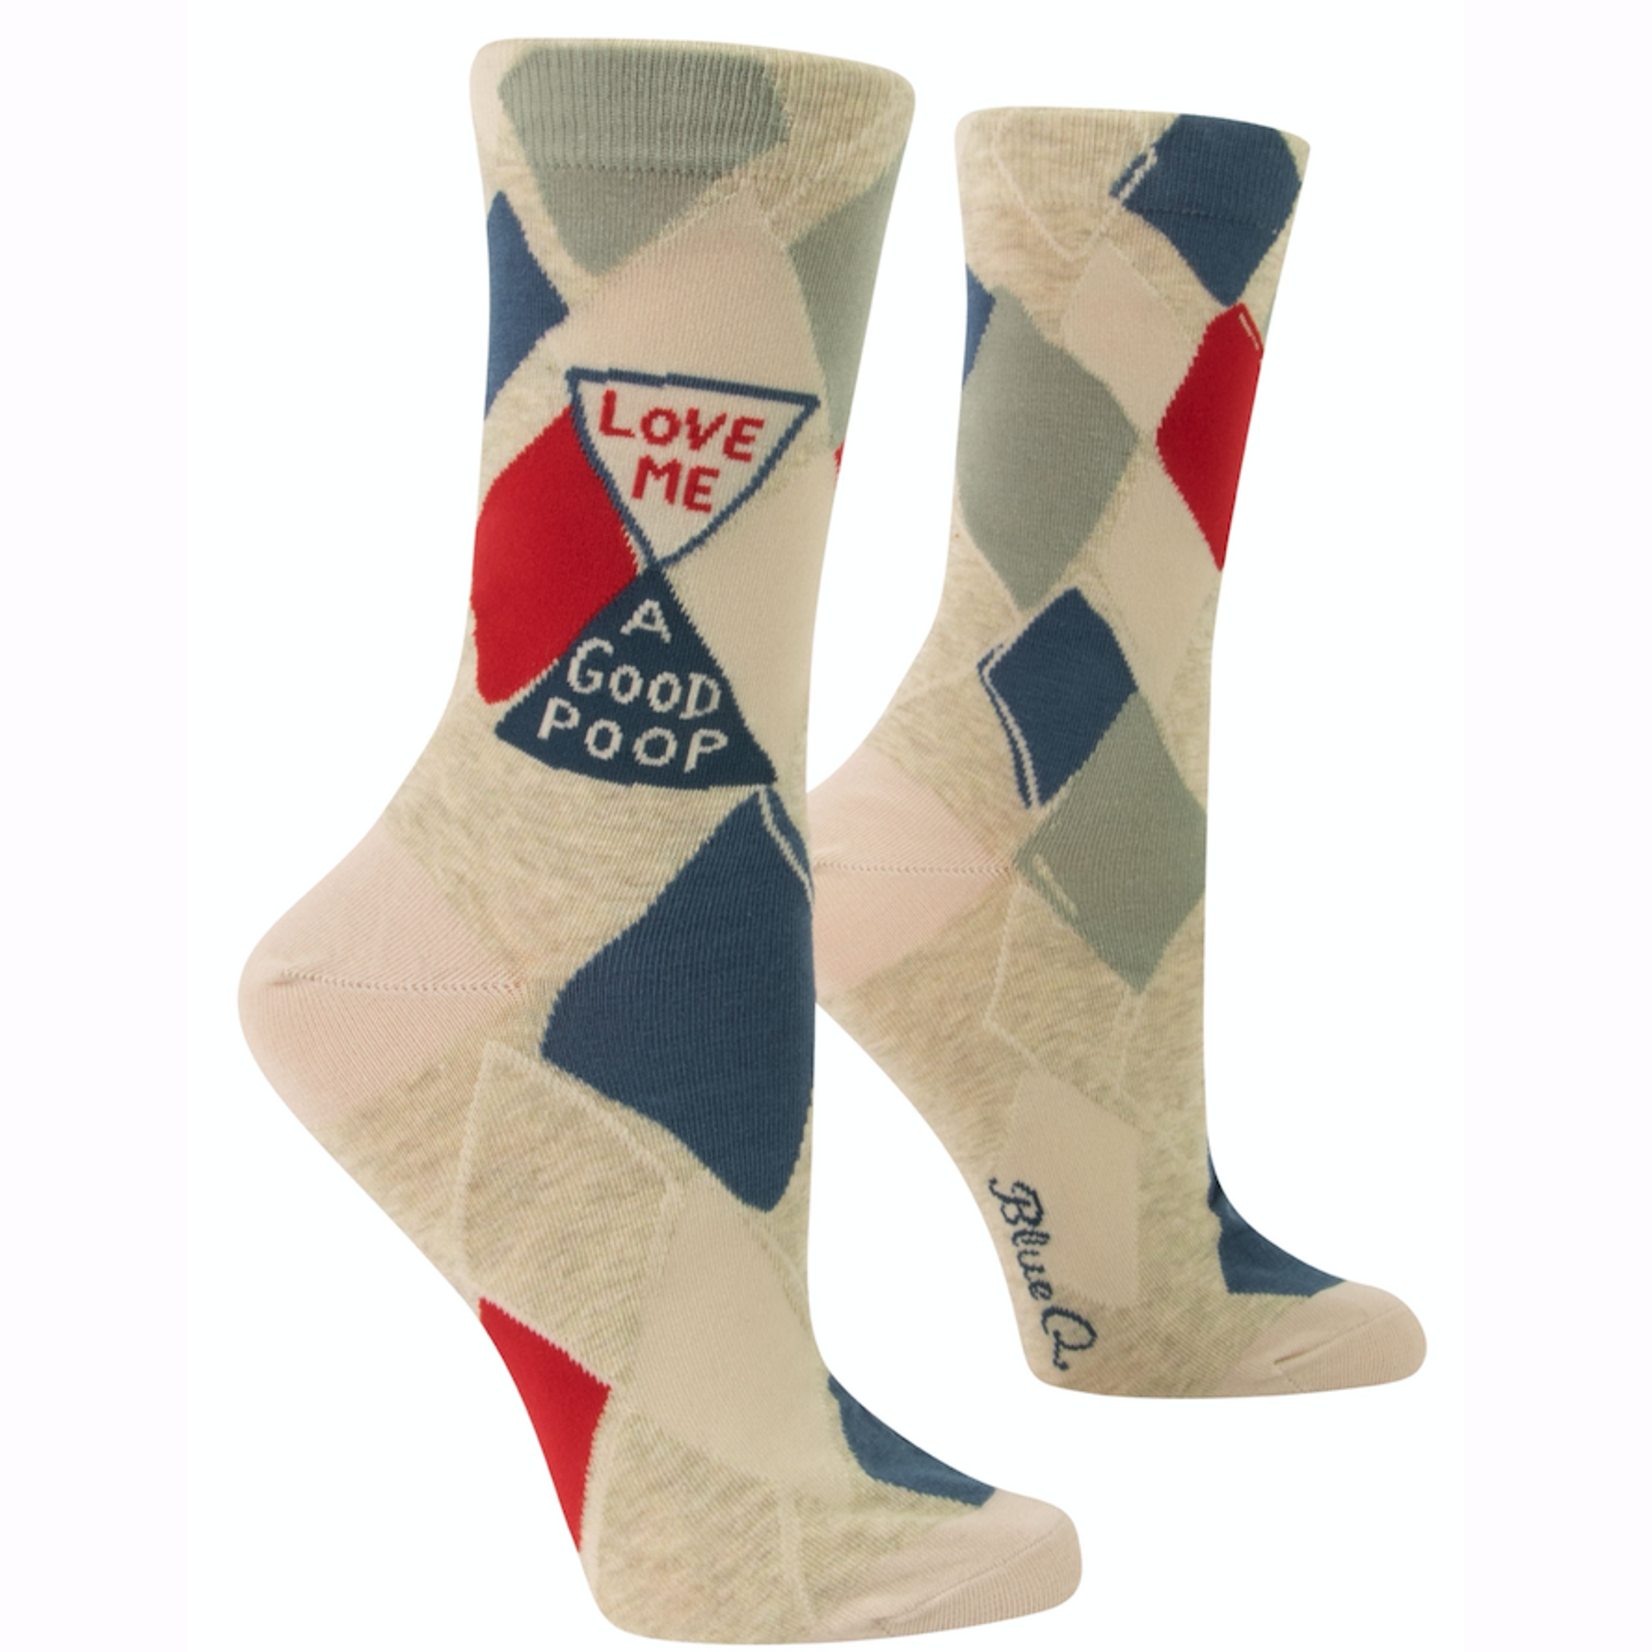 Love A Good Poop Women's Crew Socks